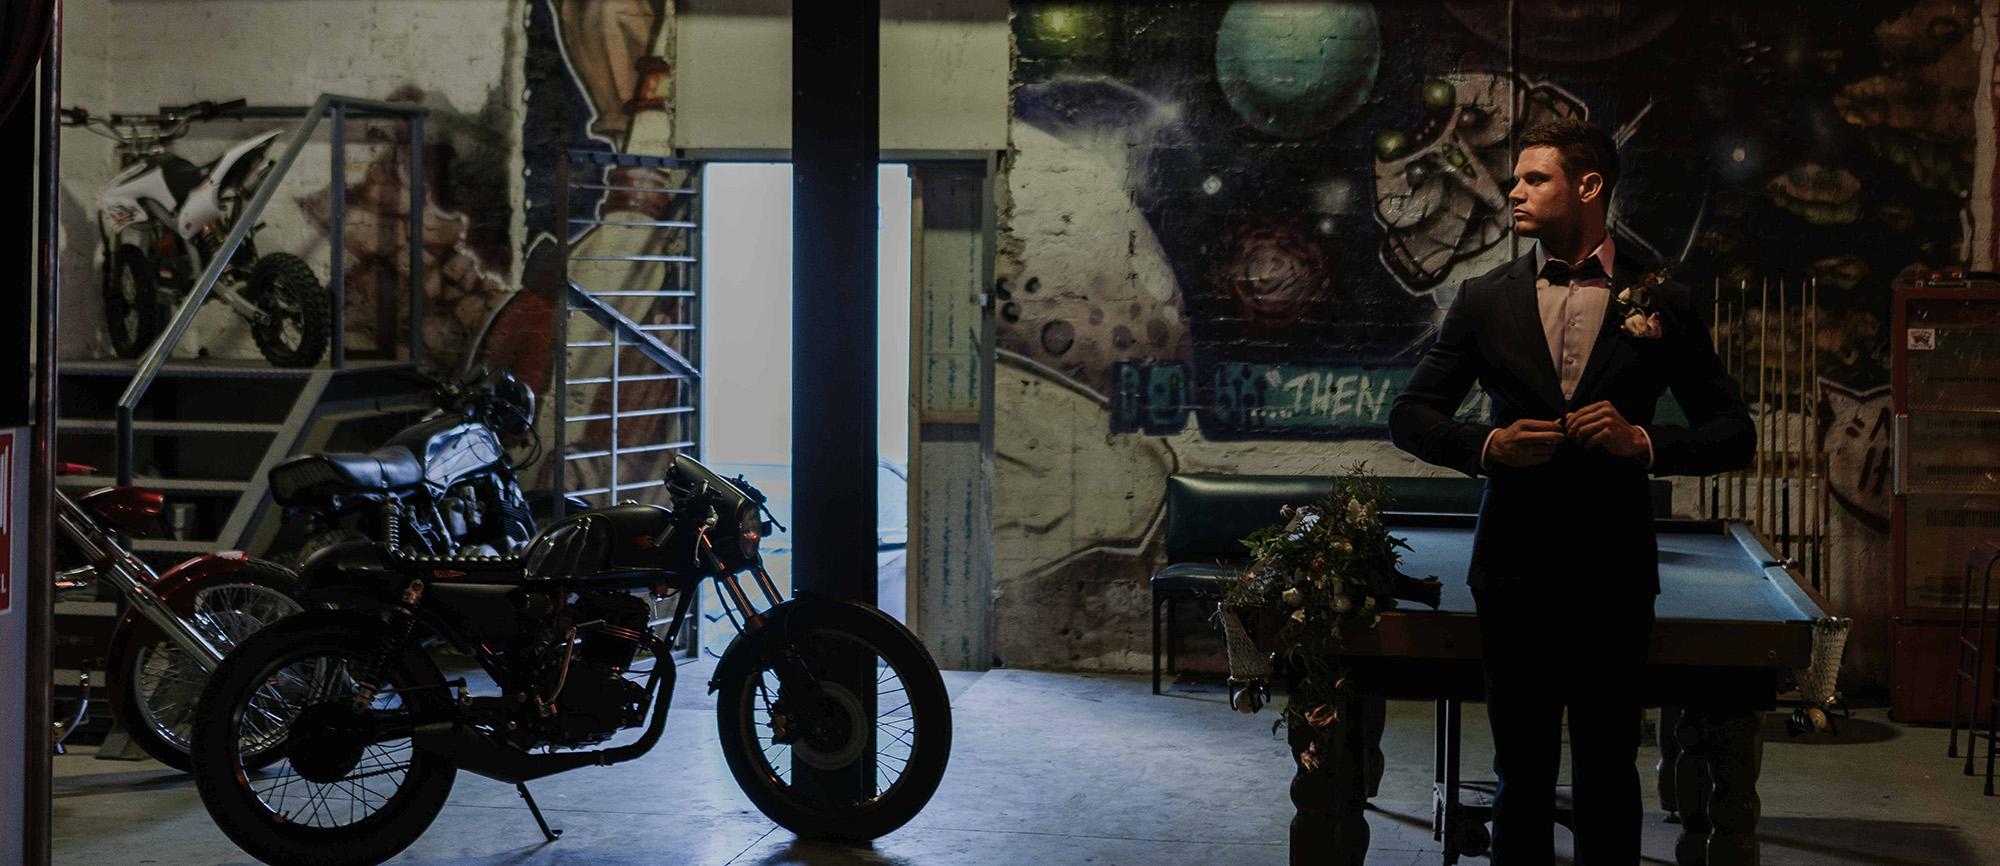 Smoked Garage Wedding Venue & Cafe